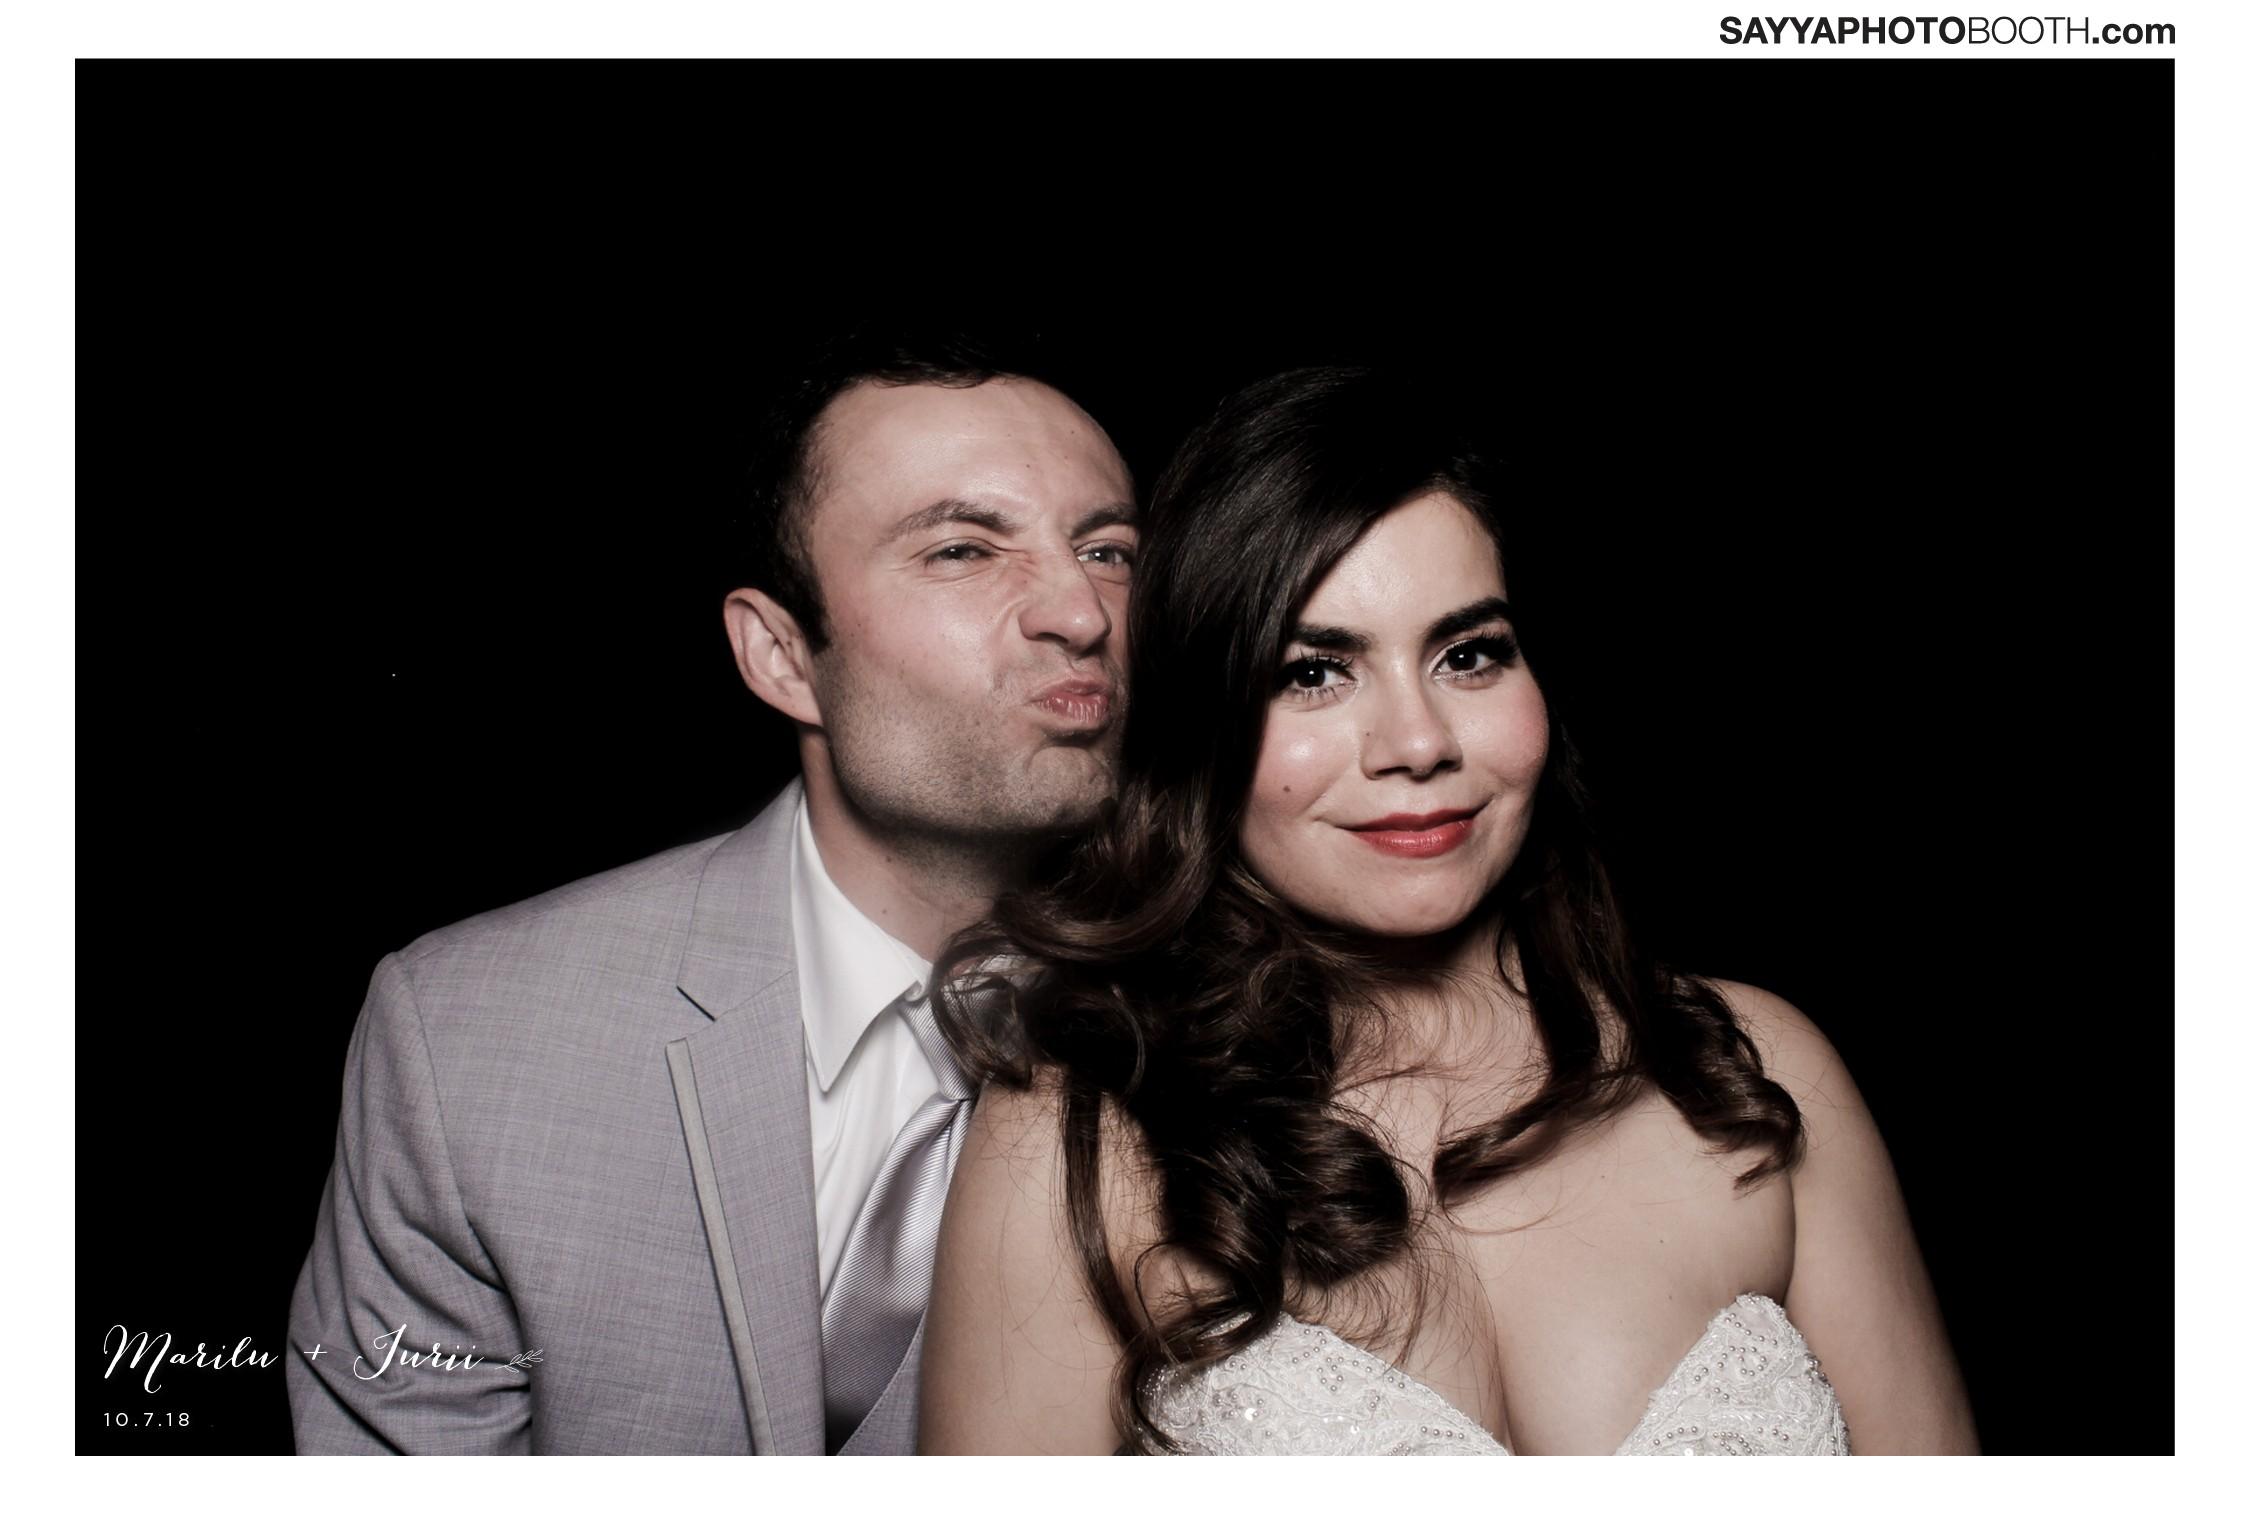 Marilu and Iurii's Wedding